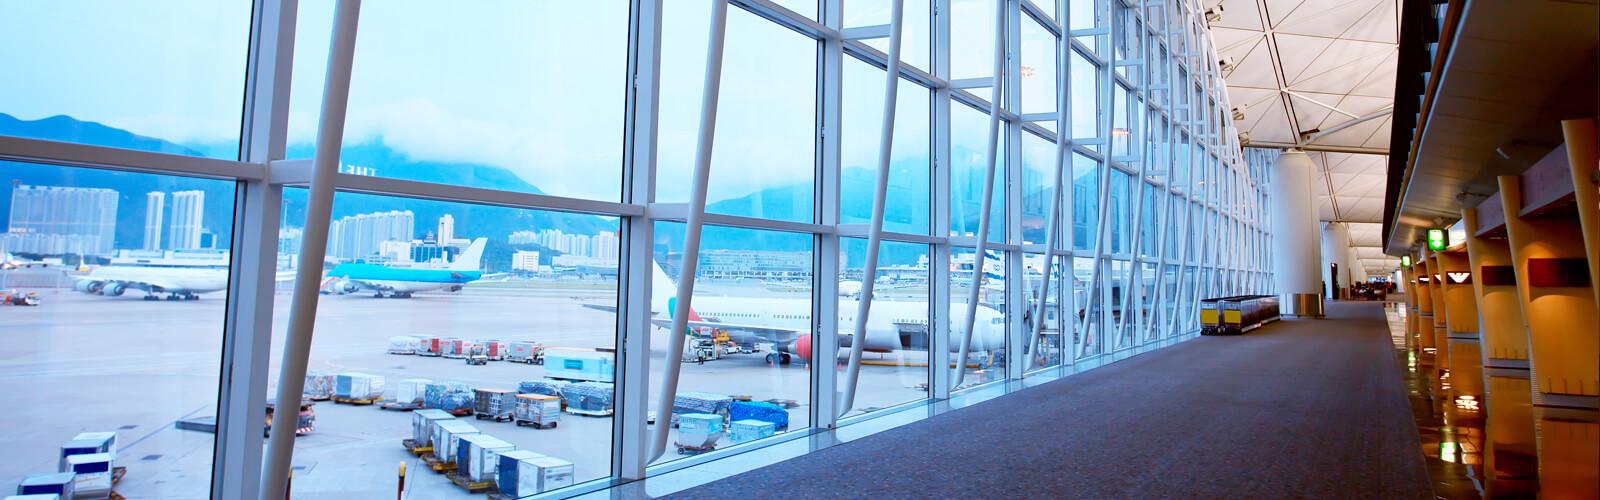 optimized_banner-airport.jpg